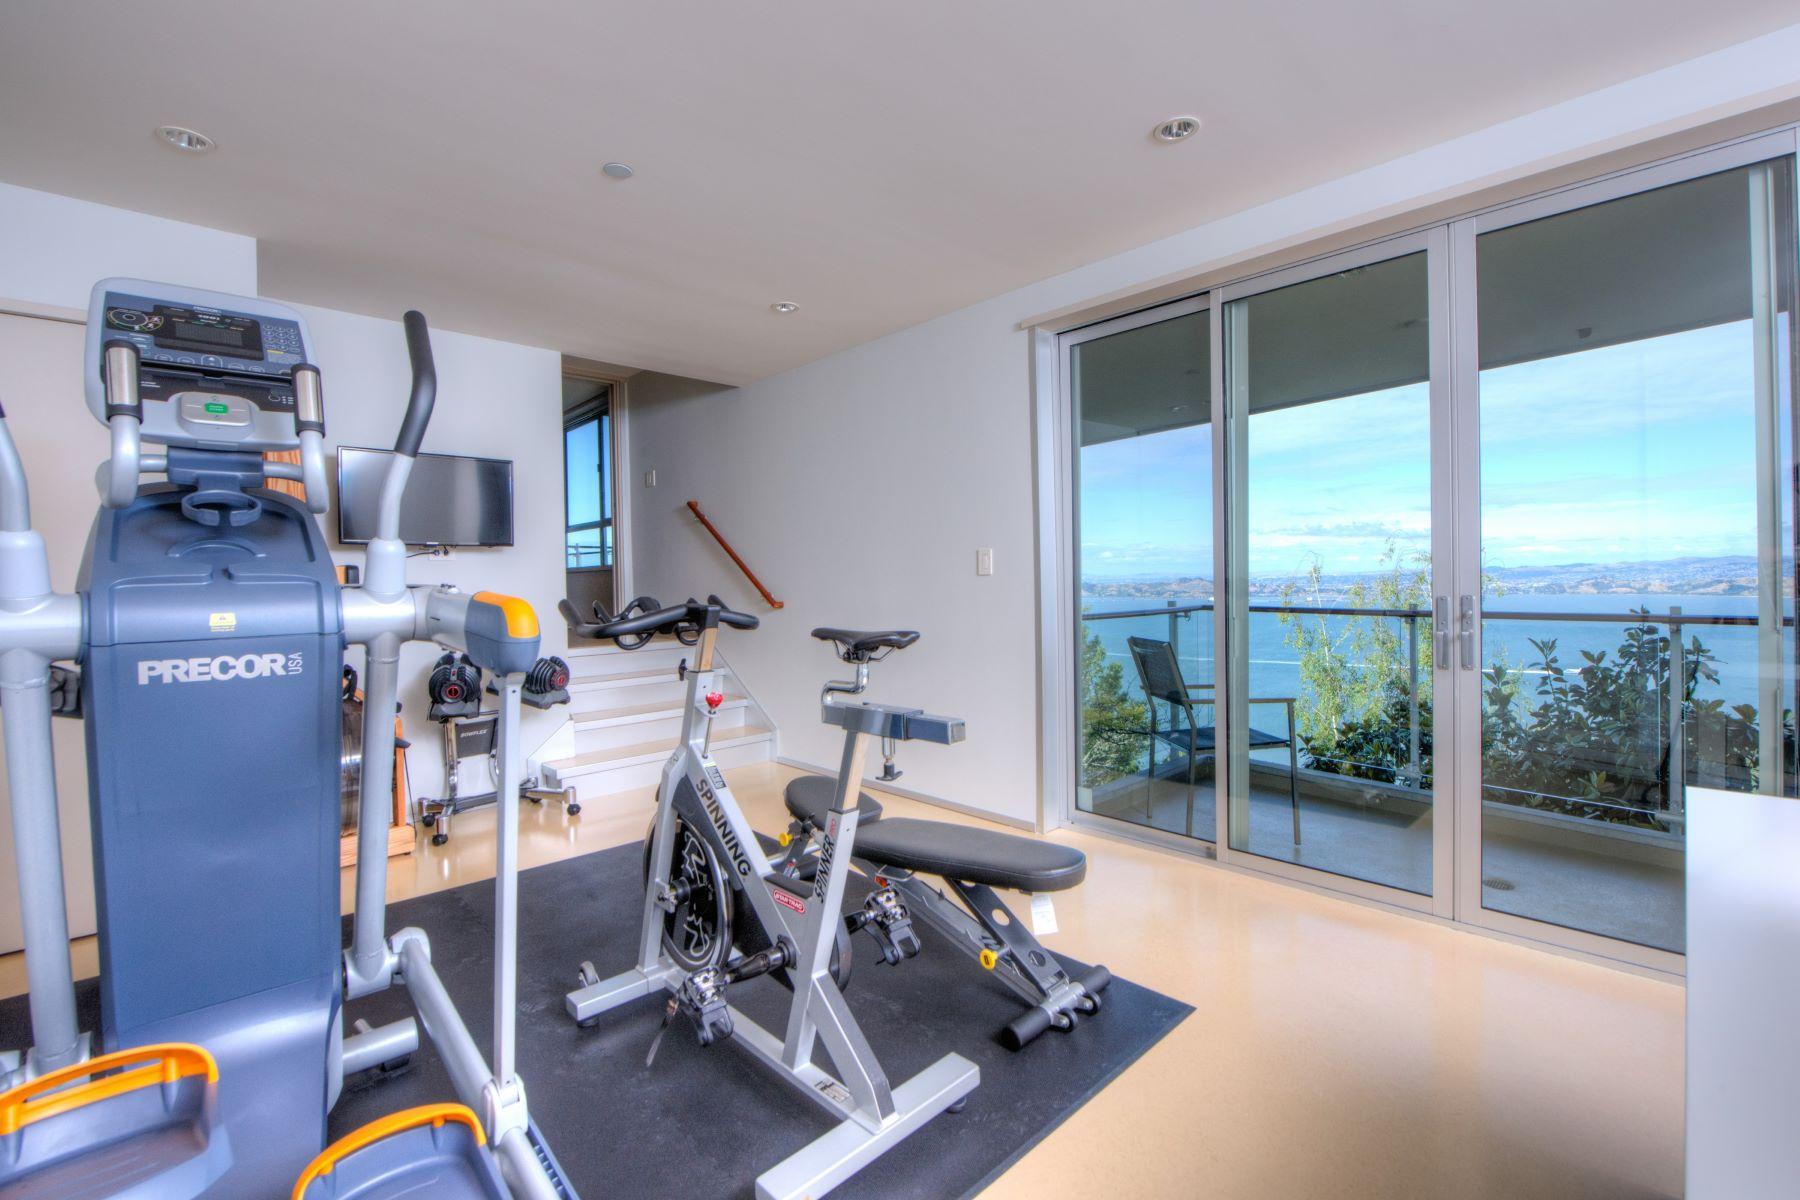 Additional photo for property listing at Above and Beyond 116 Sugarloaf Dr Tiburon, California 94920 Estados Unidos